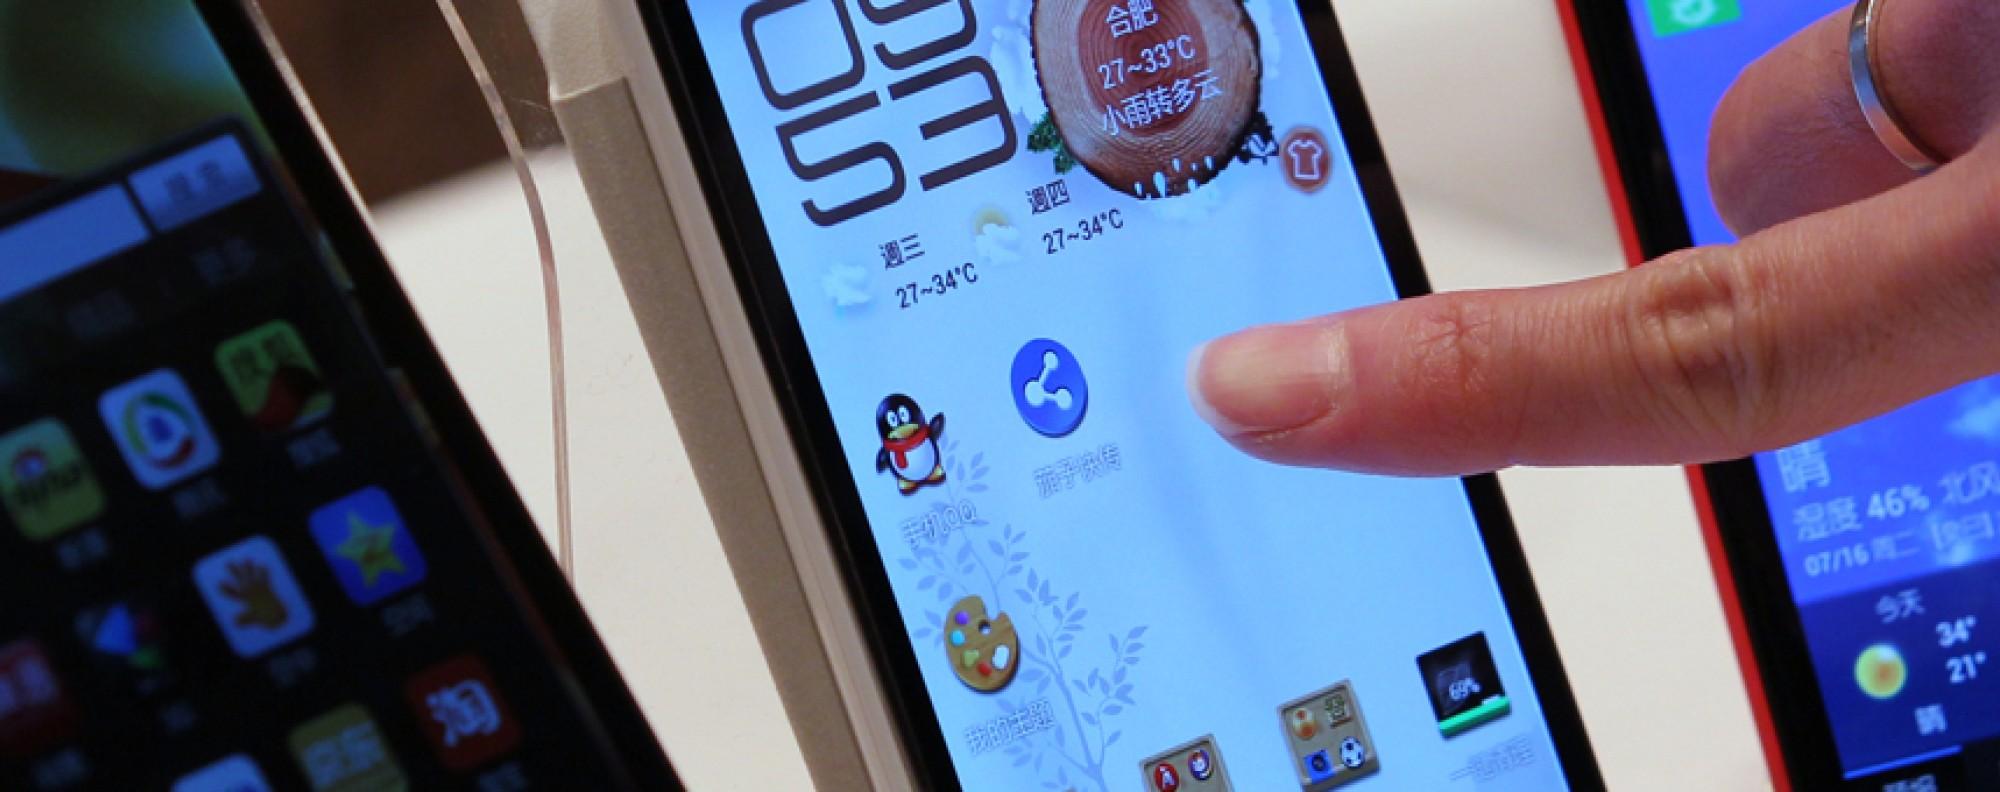 Smartphones | South China Morning Post